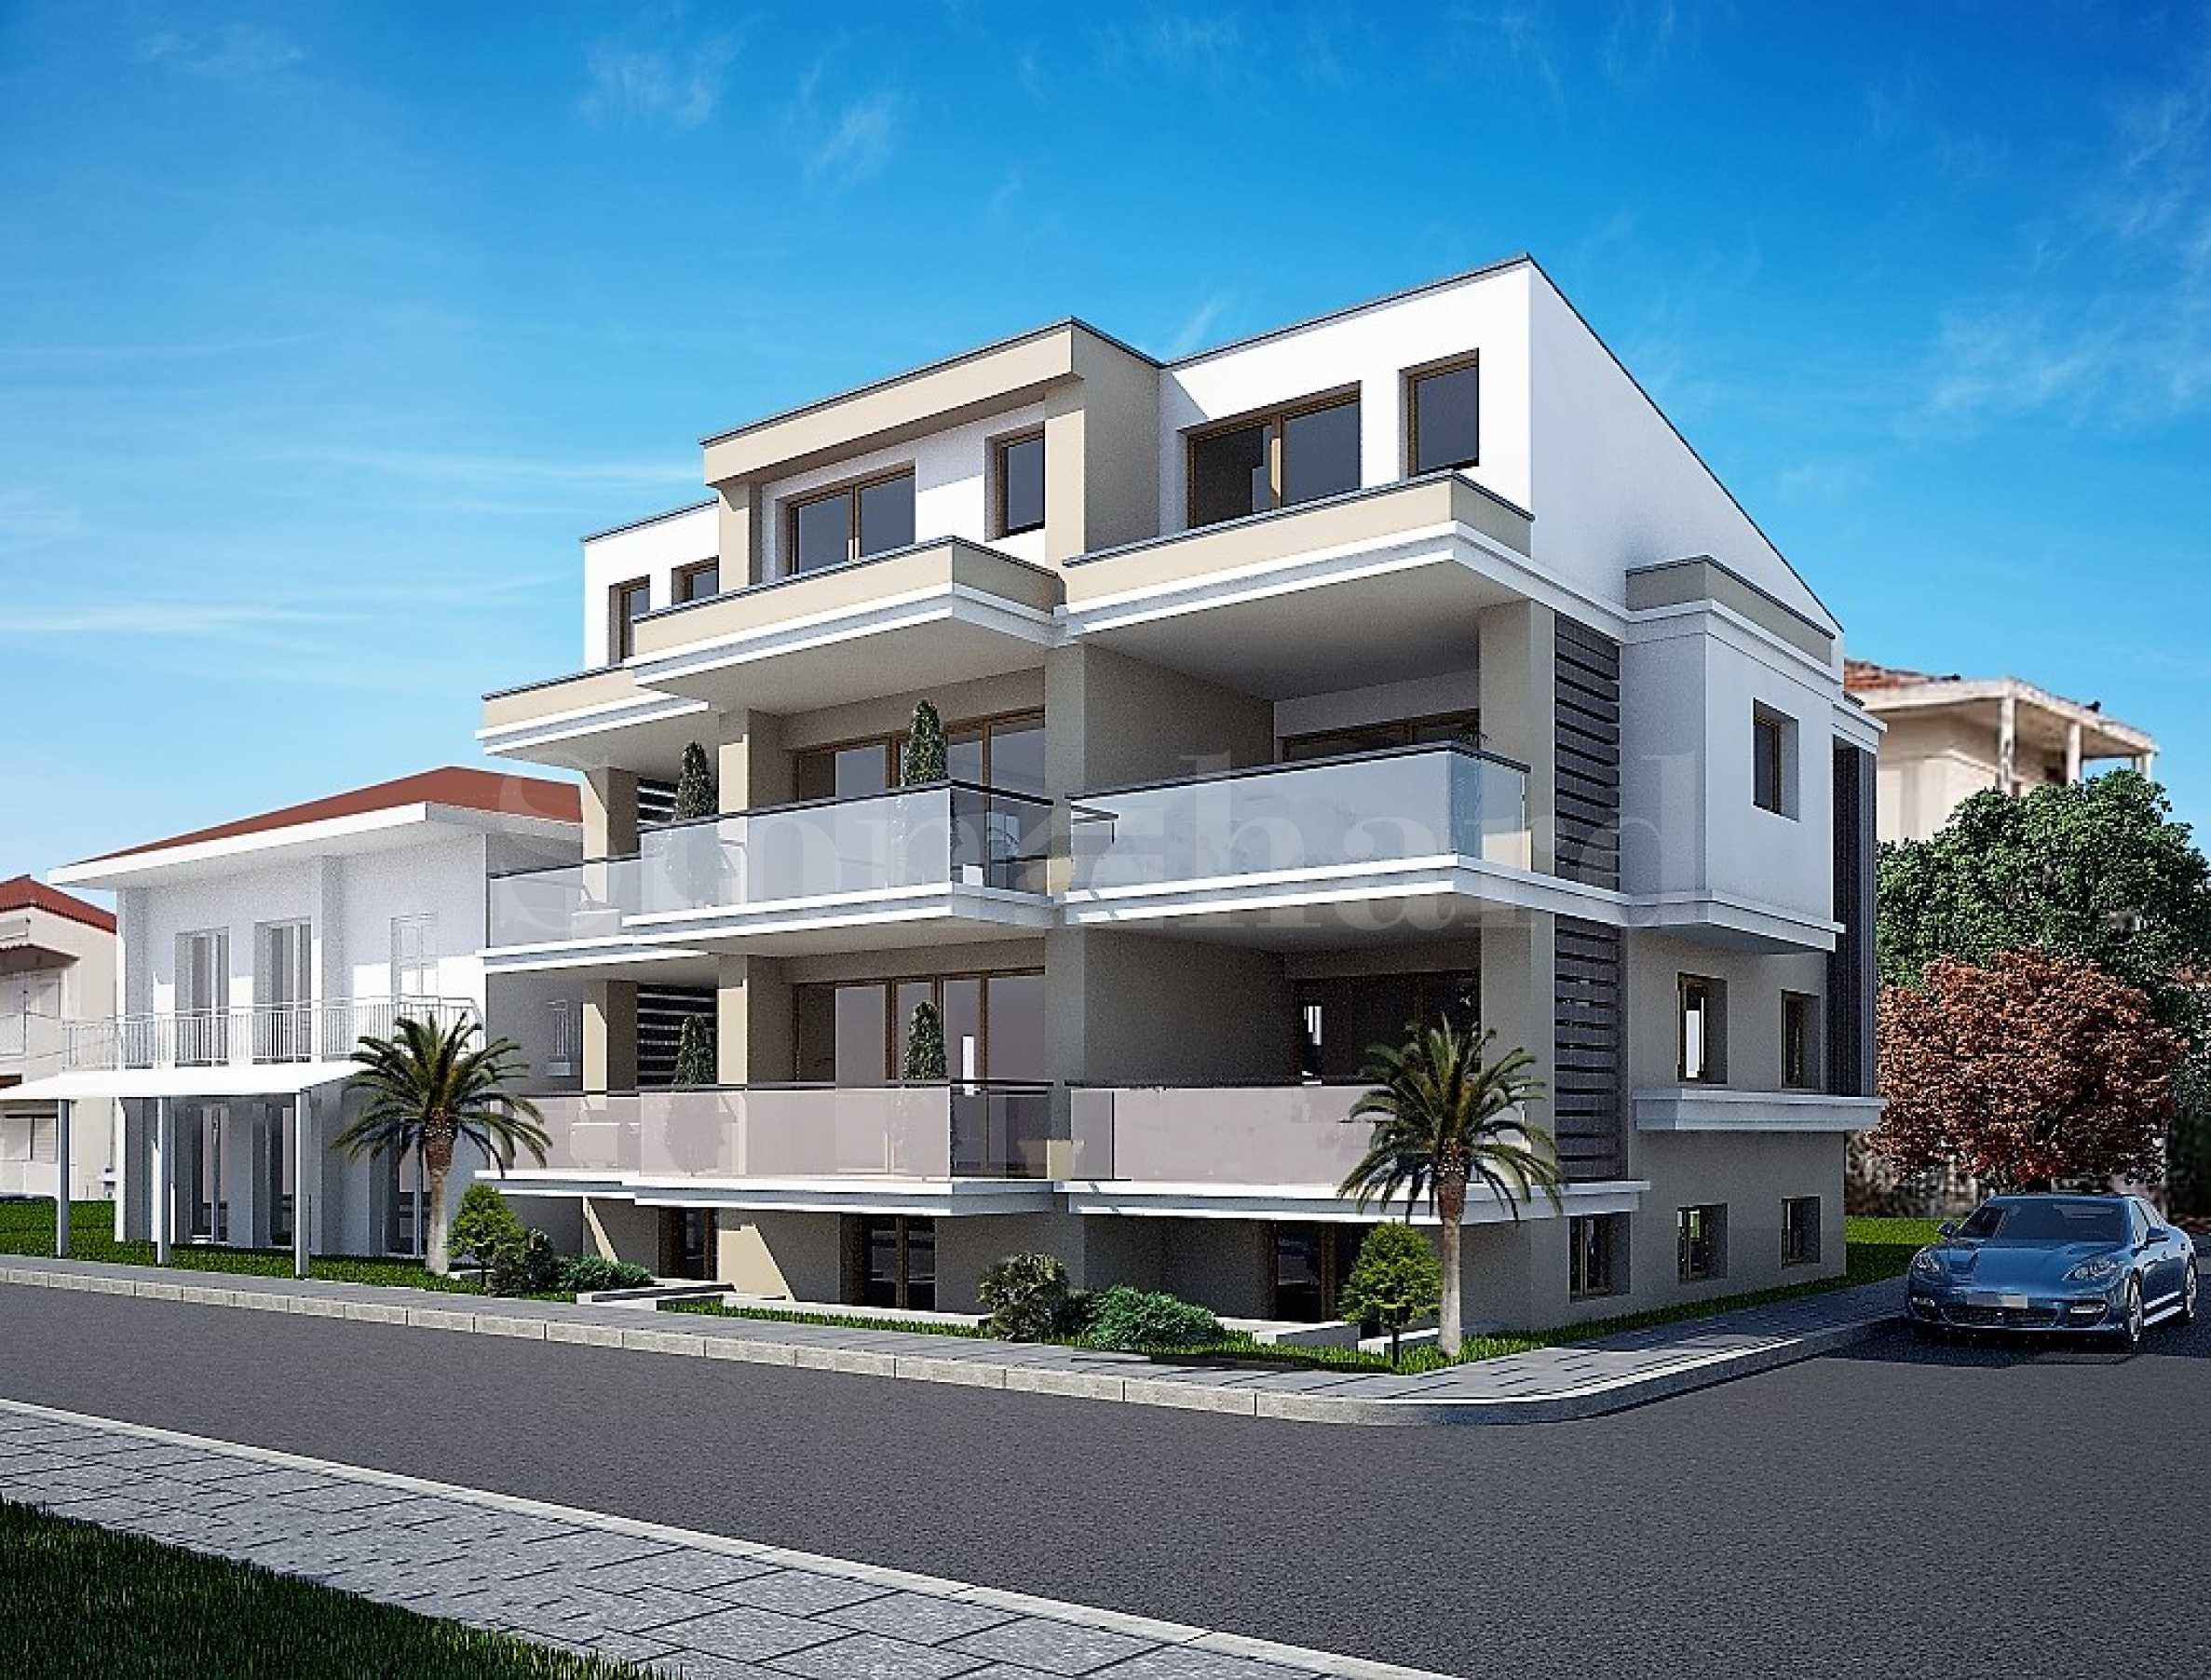 1-bedroom apartment in 1 - Stonehard